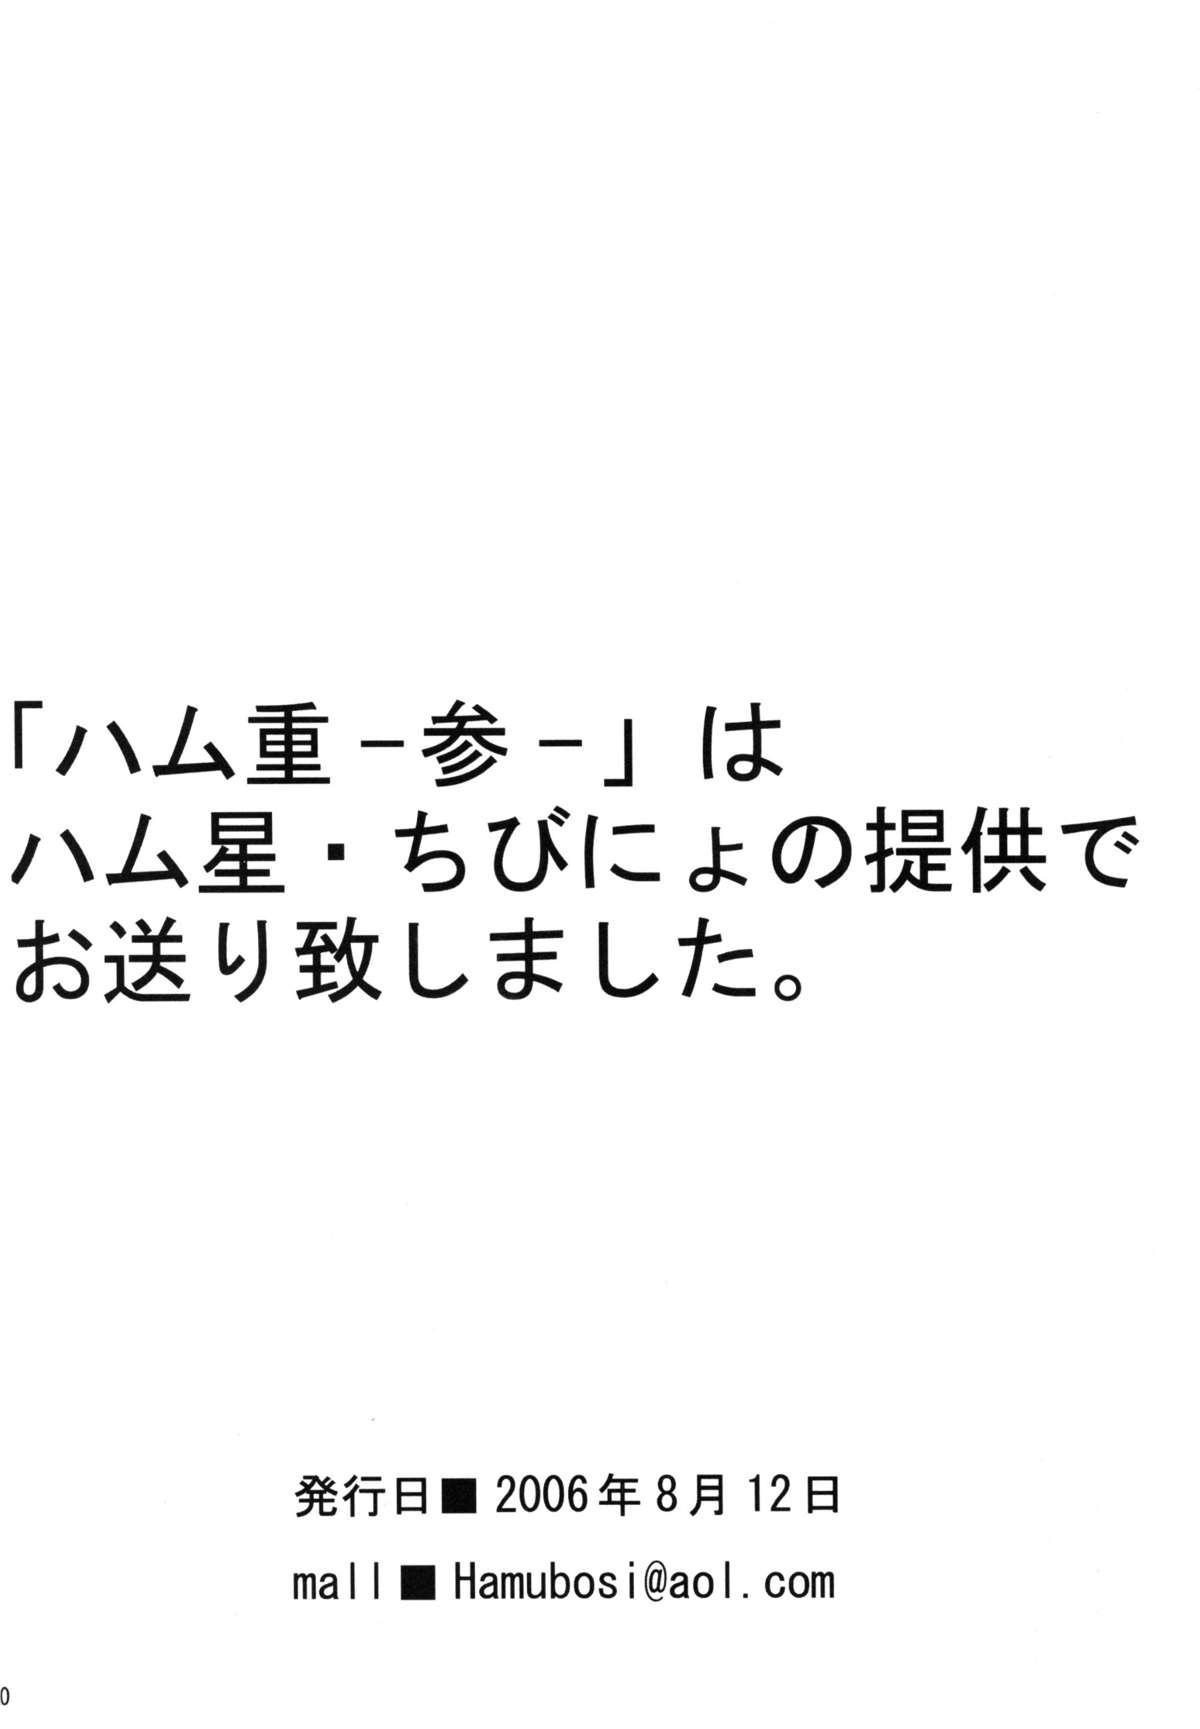 (C70) [HAMUSTAR (Chibinyo)] Hamu-juu -San- (Naruto) 18